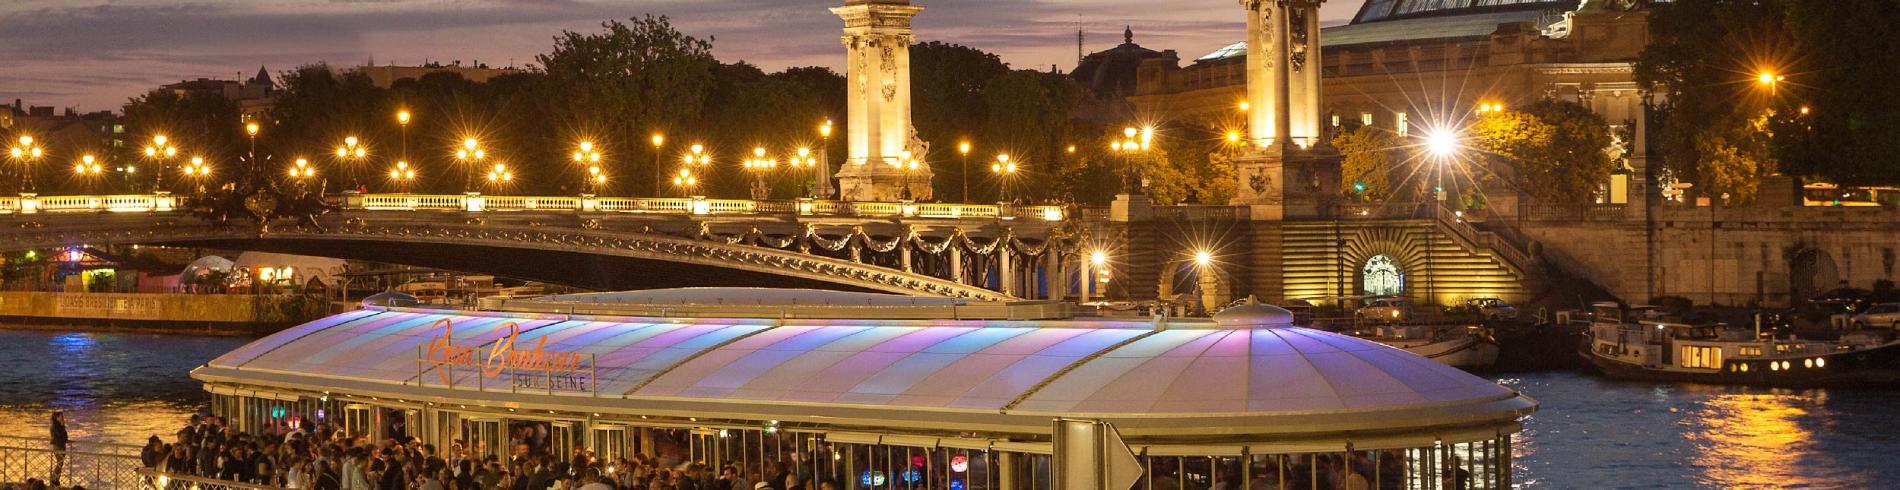 Nights on the Seine at Rosa Bonheur